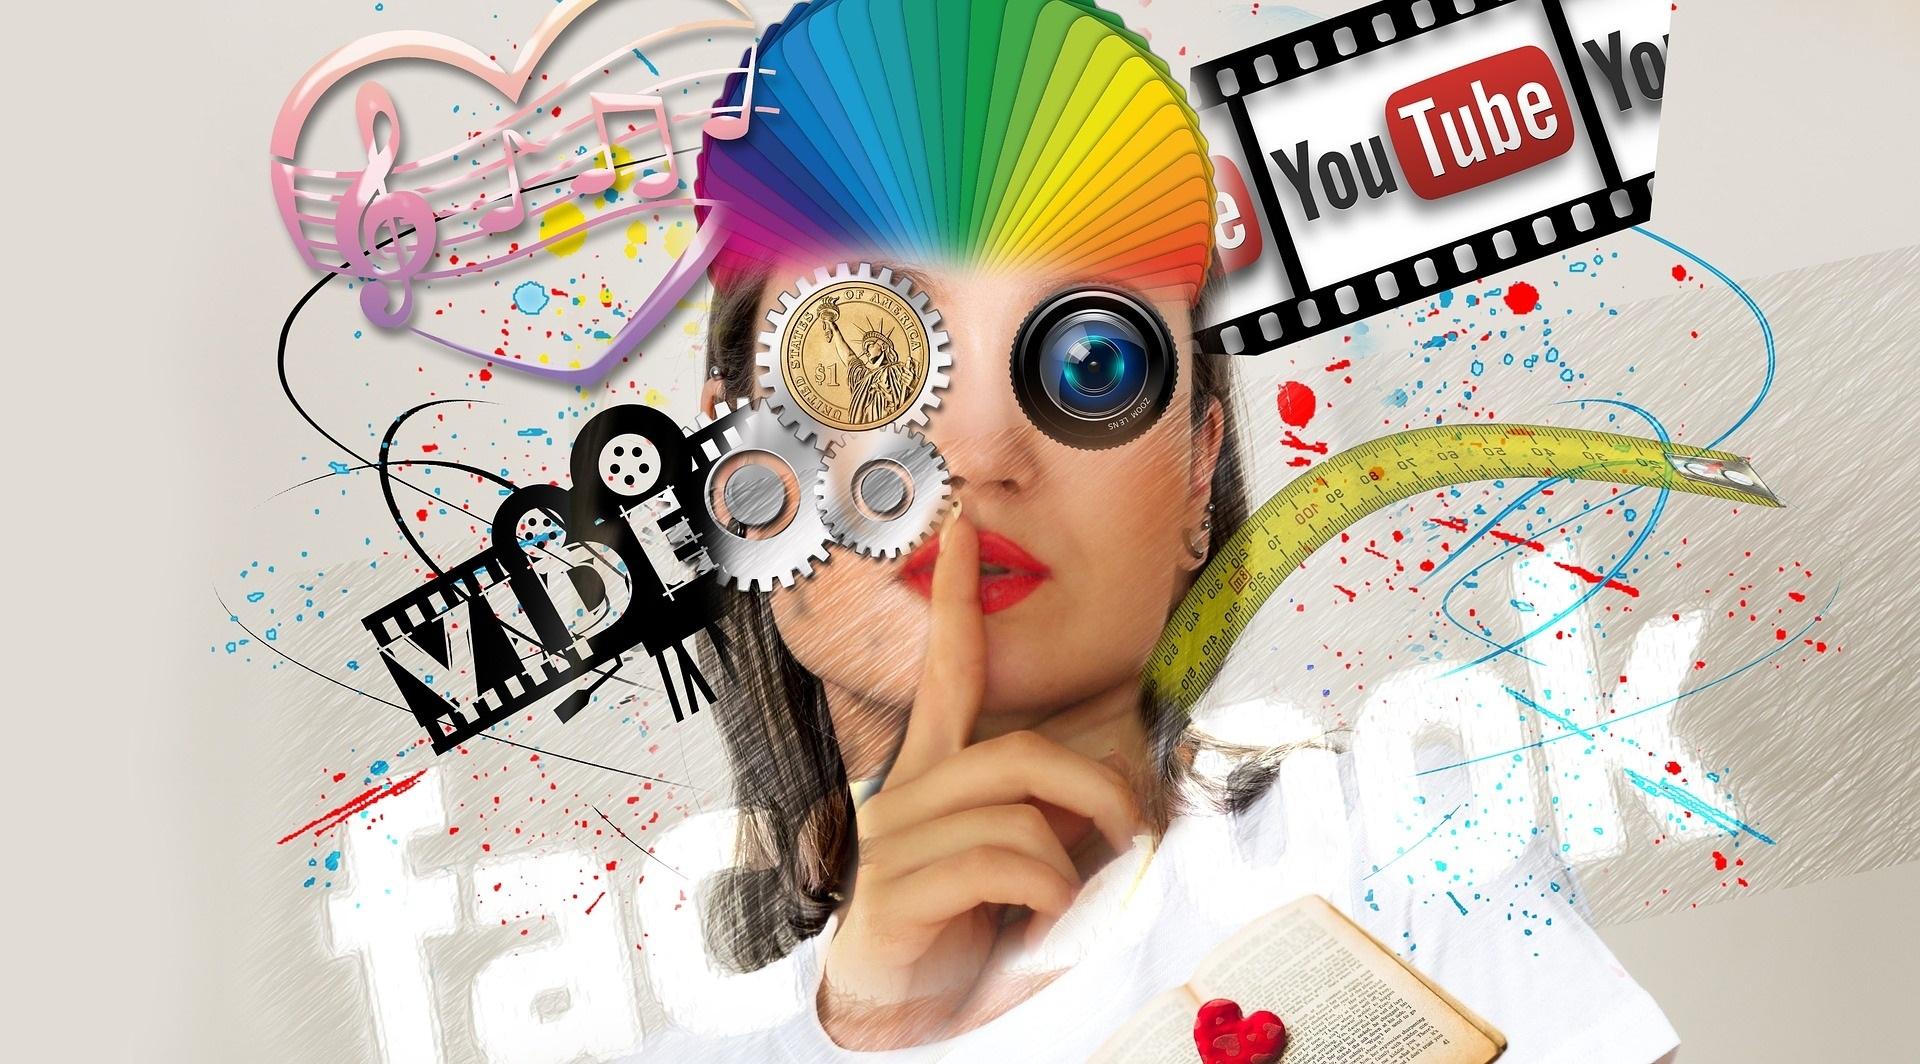 The changing social media marketing landscape